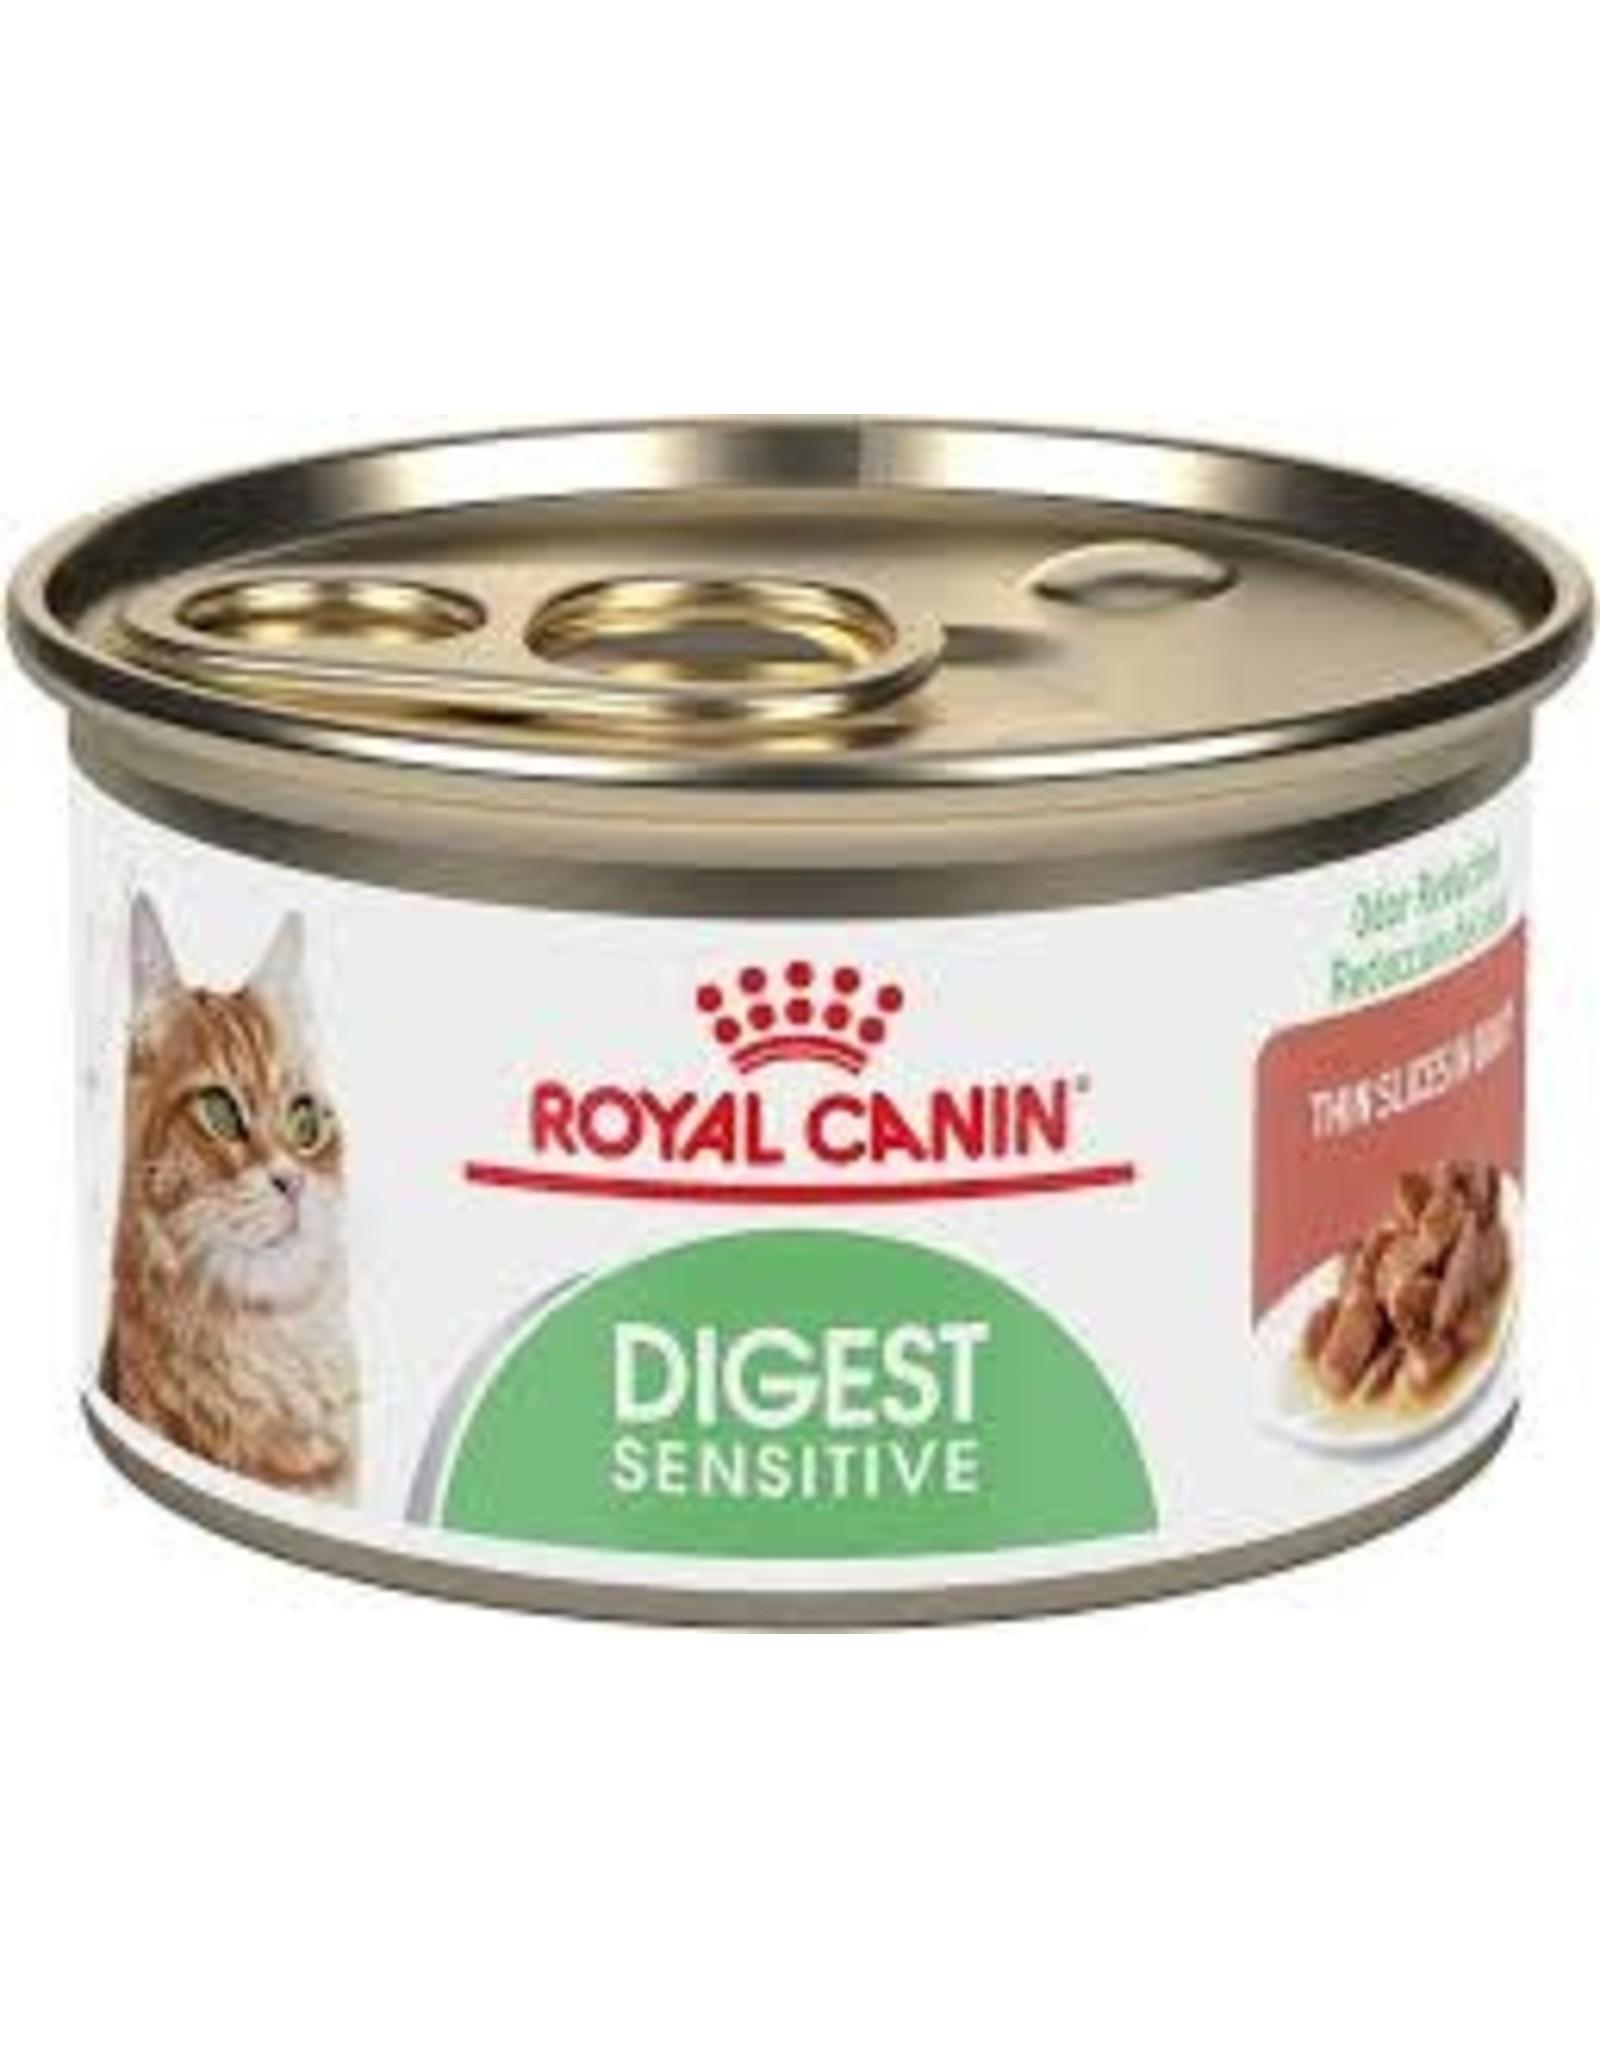 Royal Canin Royal Canin - Digestive Sensitive Thin Slice 85g